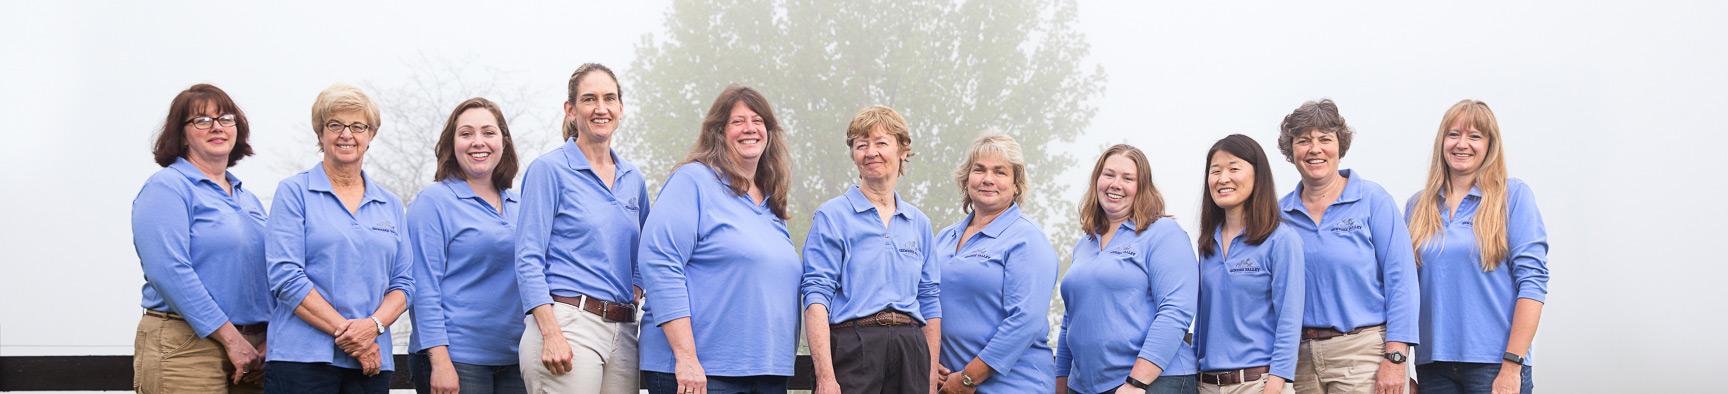 GVEC staff